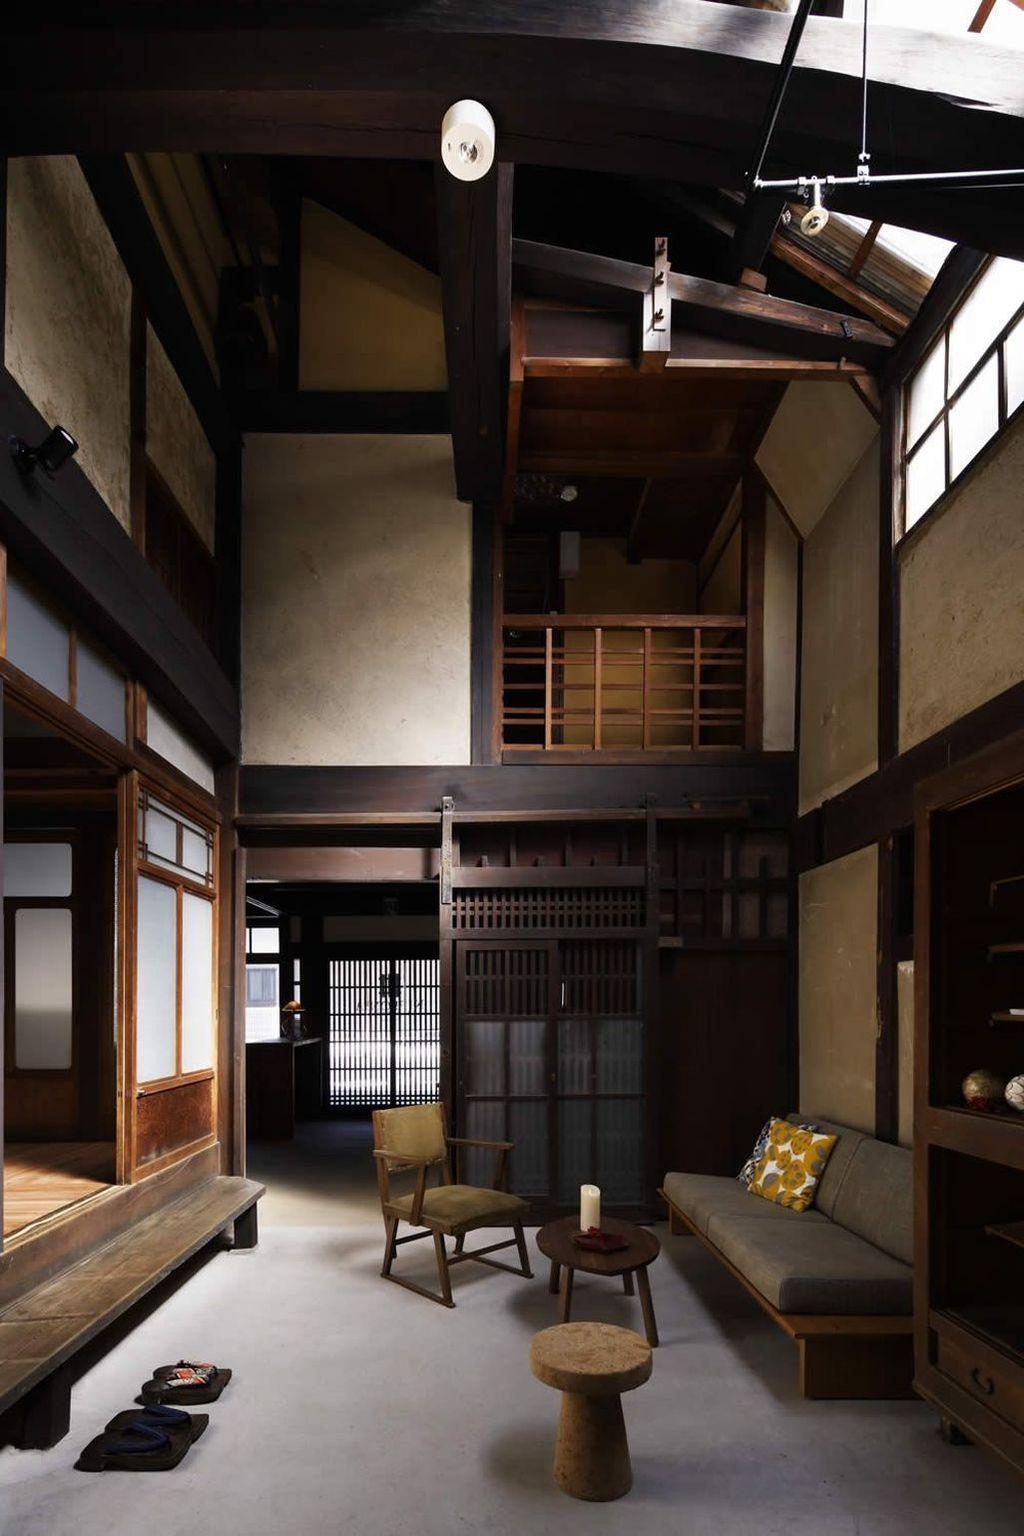 42 Inspiring Traditional Living Room Design Ideas Japanese Interior Design Japanese Style House Modern Japanese Interior